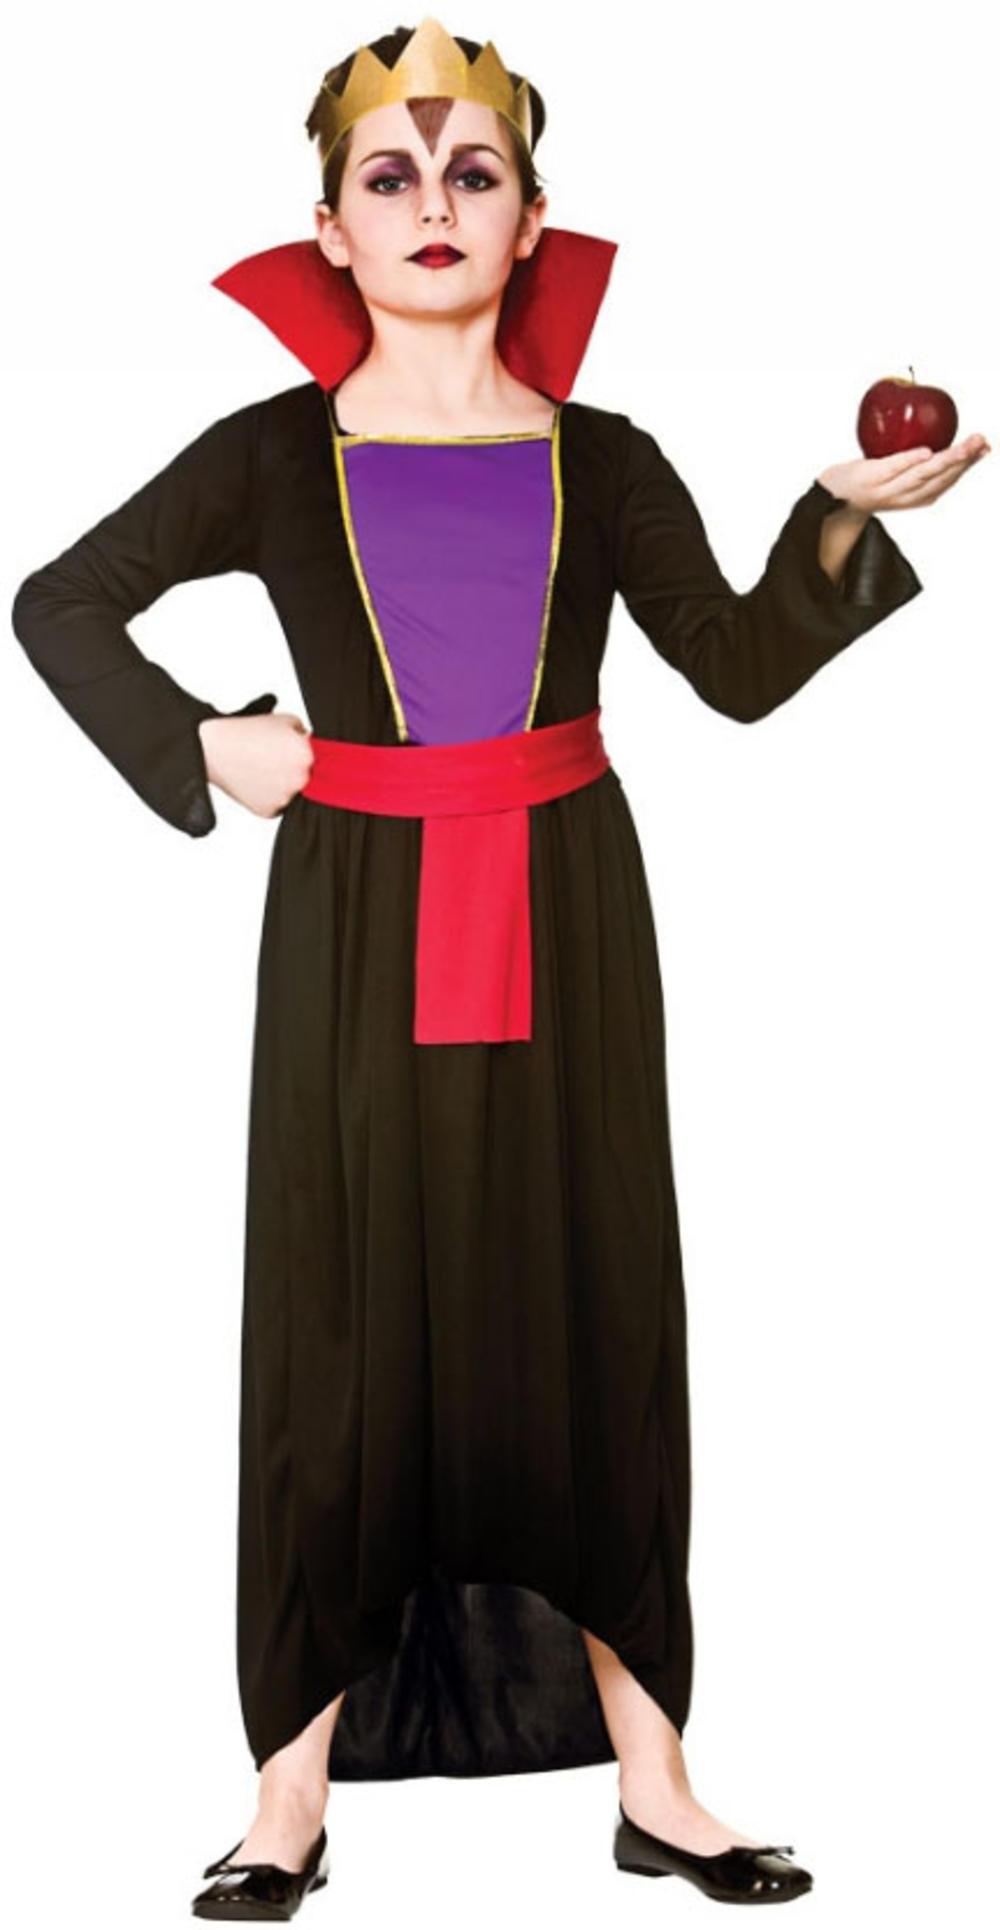 Wicked Queen Girls Fancy Dress Fairytale Villain Halloween Childrens Kid Costume